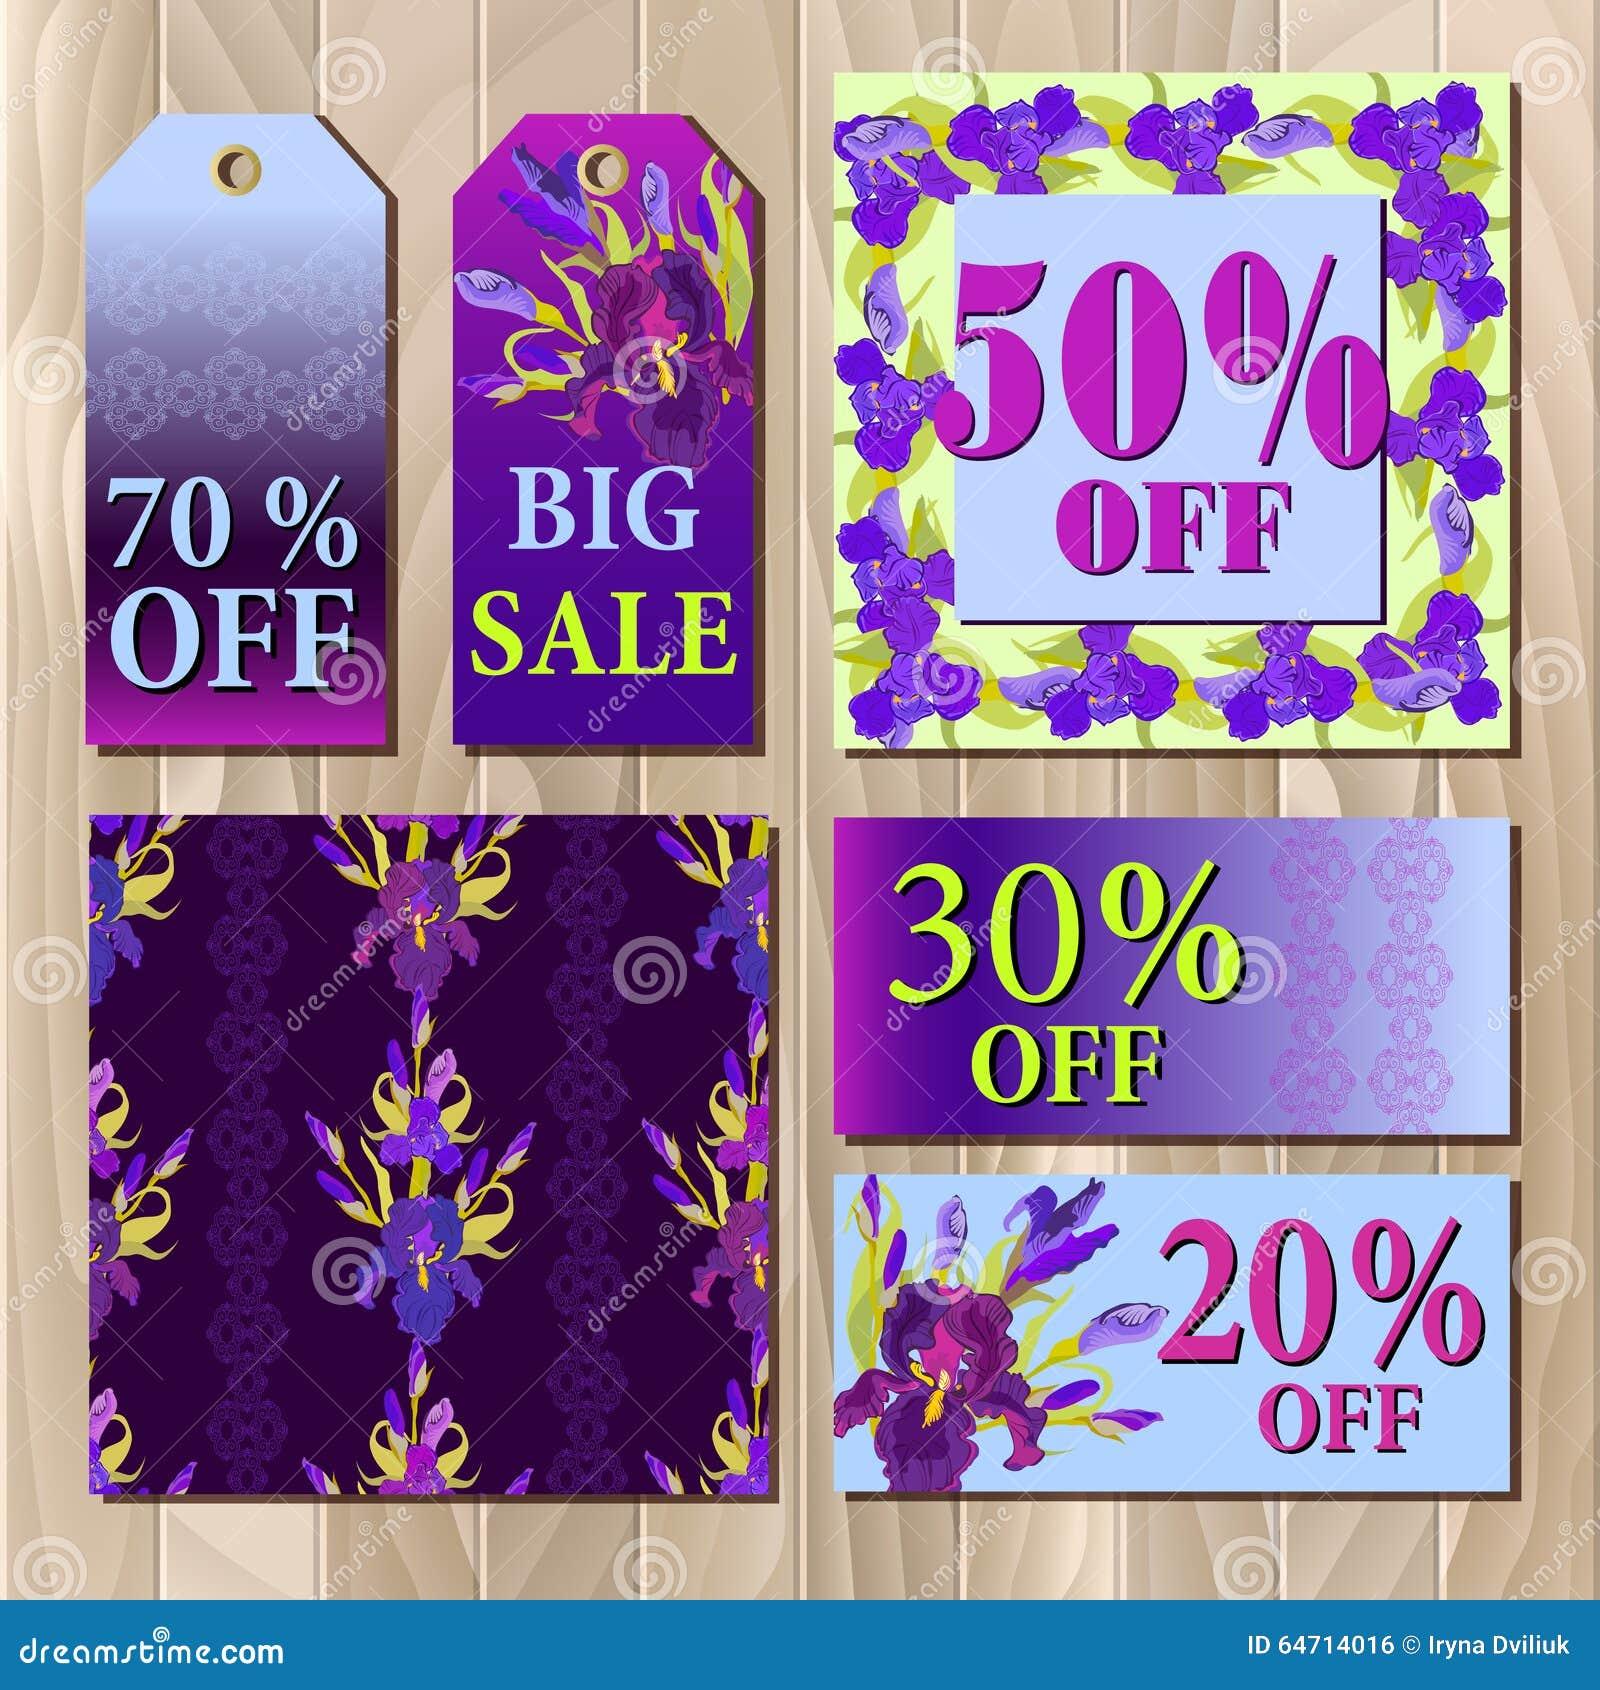 Big Sale Printable Card Template With Purple Iris Flower Design